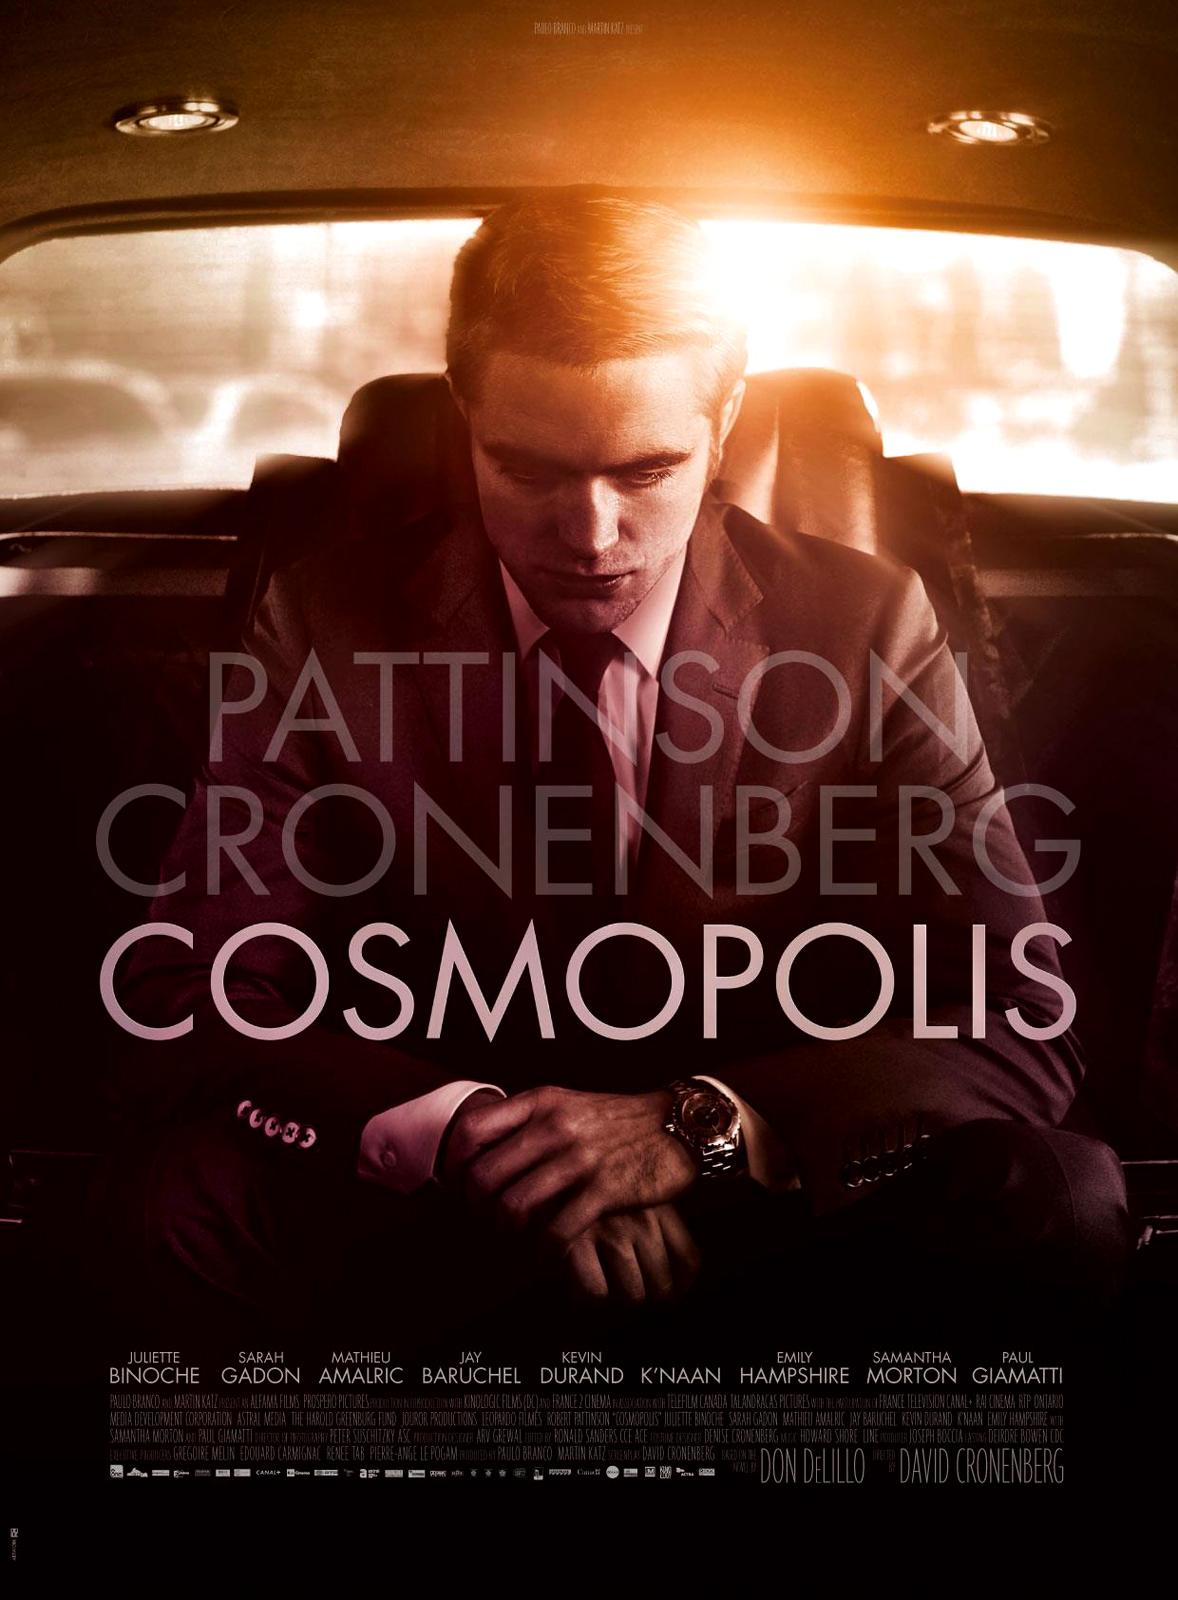 http://2.bp.blogspot.com/-u4g3K7-p-ZY/UCURjXURFeI/AAAAAAAADpg/drEidF7UO24/s1600/Cosmopolis_Movie_Robert_Pattinson_Poster-Vvallpaper.Net.jpg